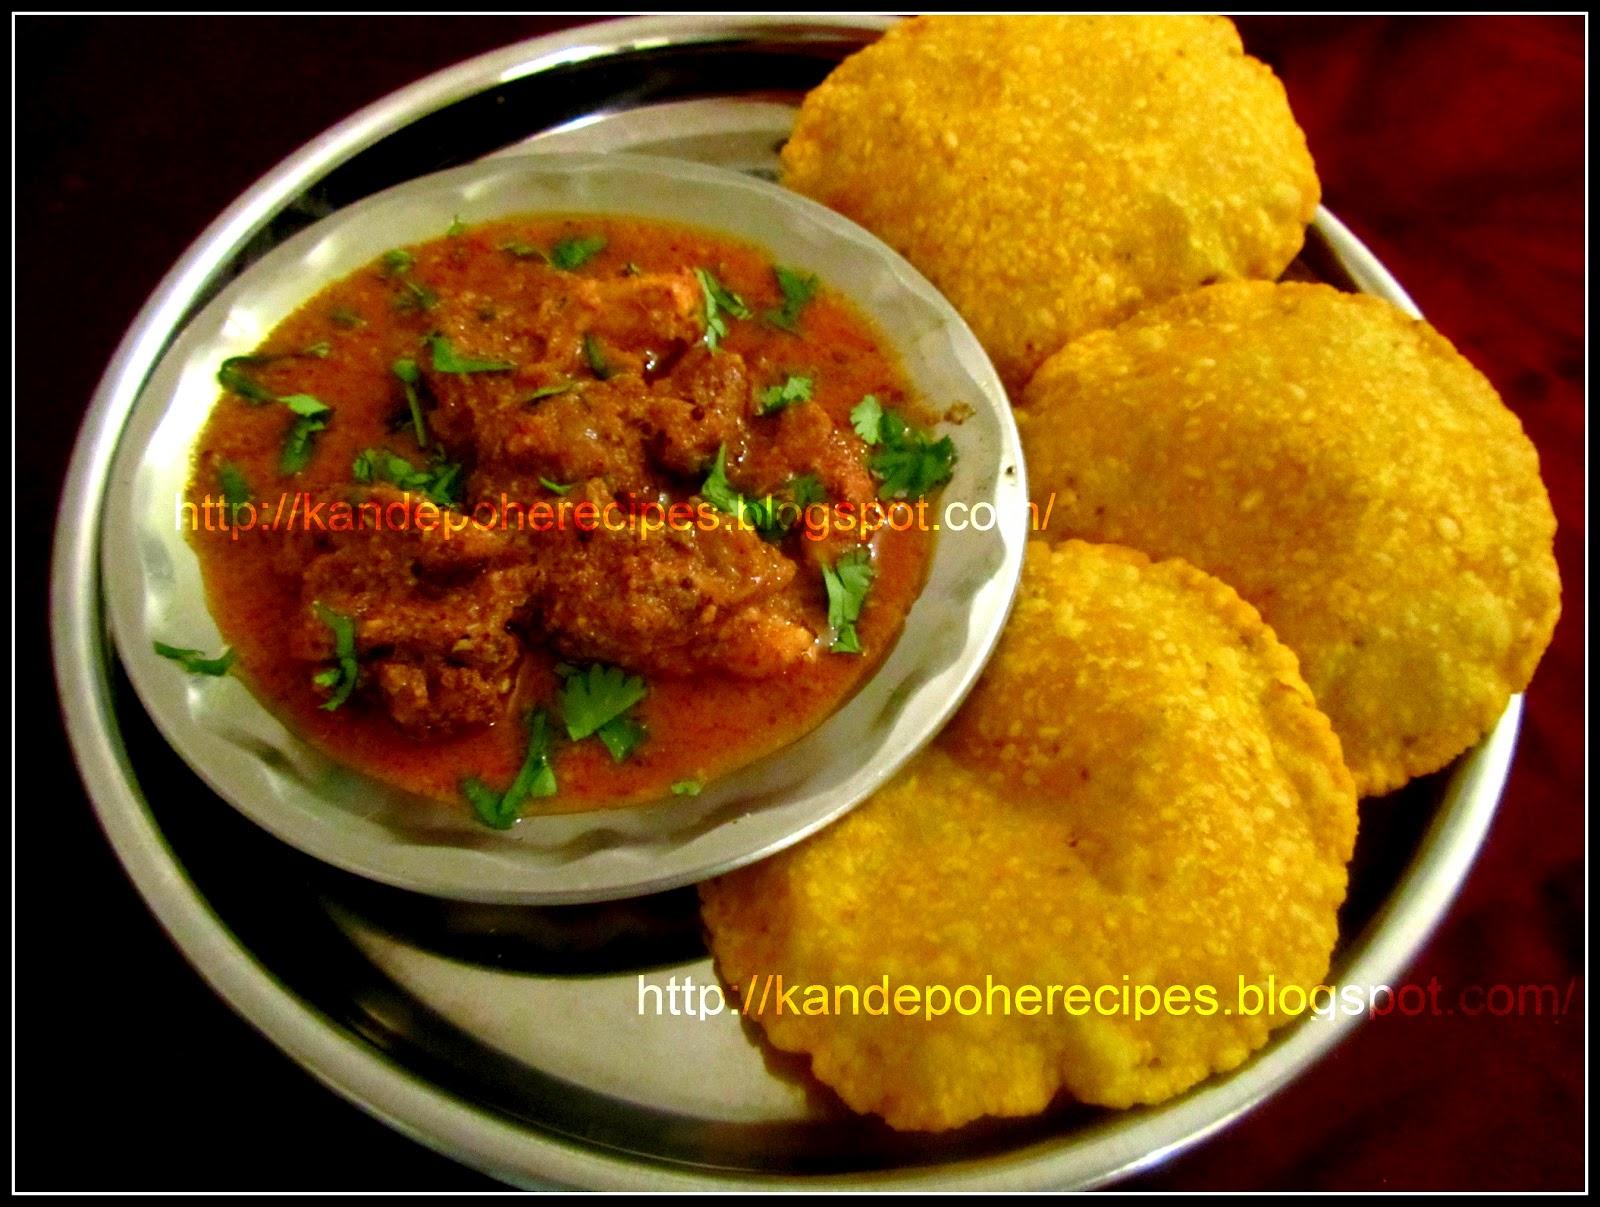 Malvani chicken curry and kombdi vade malvani vade spicy aroma malvani chicken curry and kombdi vade malvani vade forumfinder Image collections